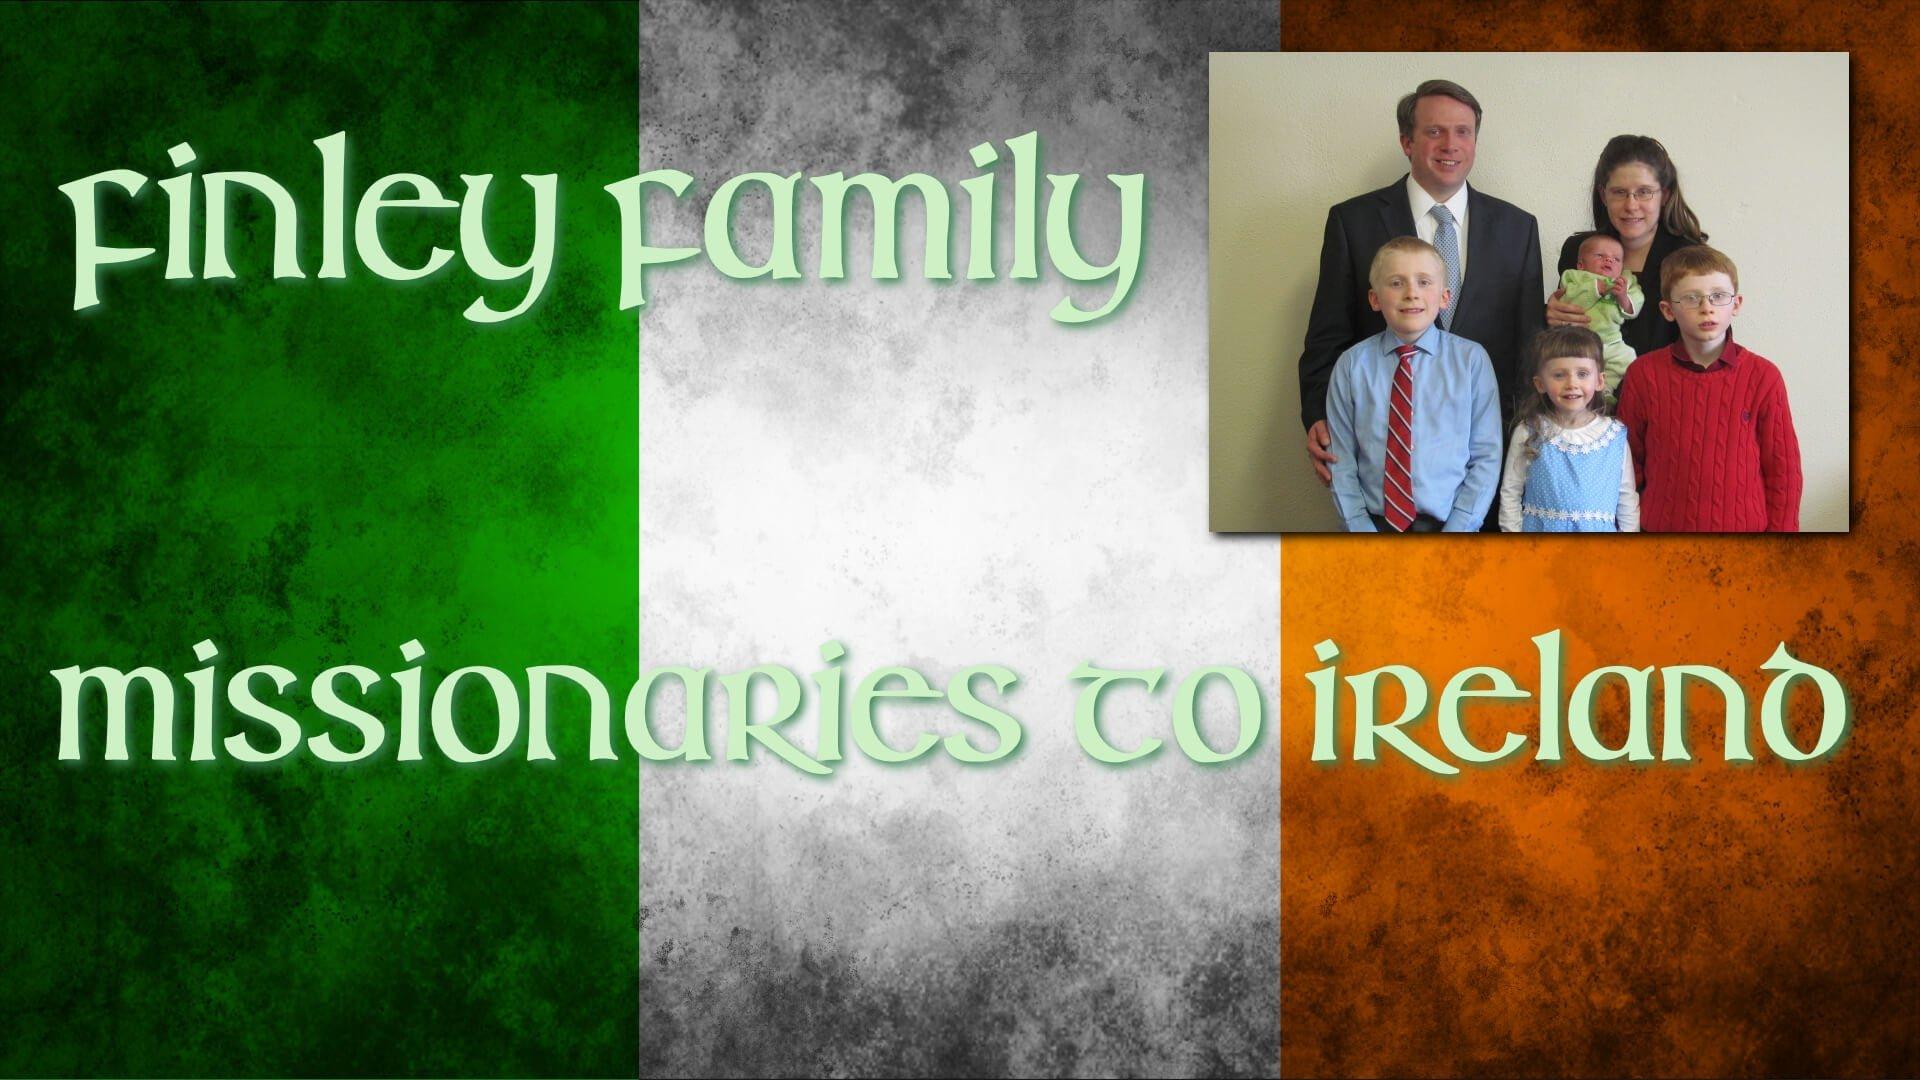 finley-ireland